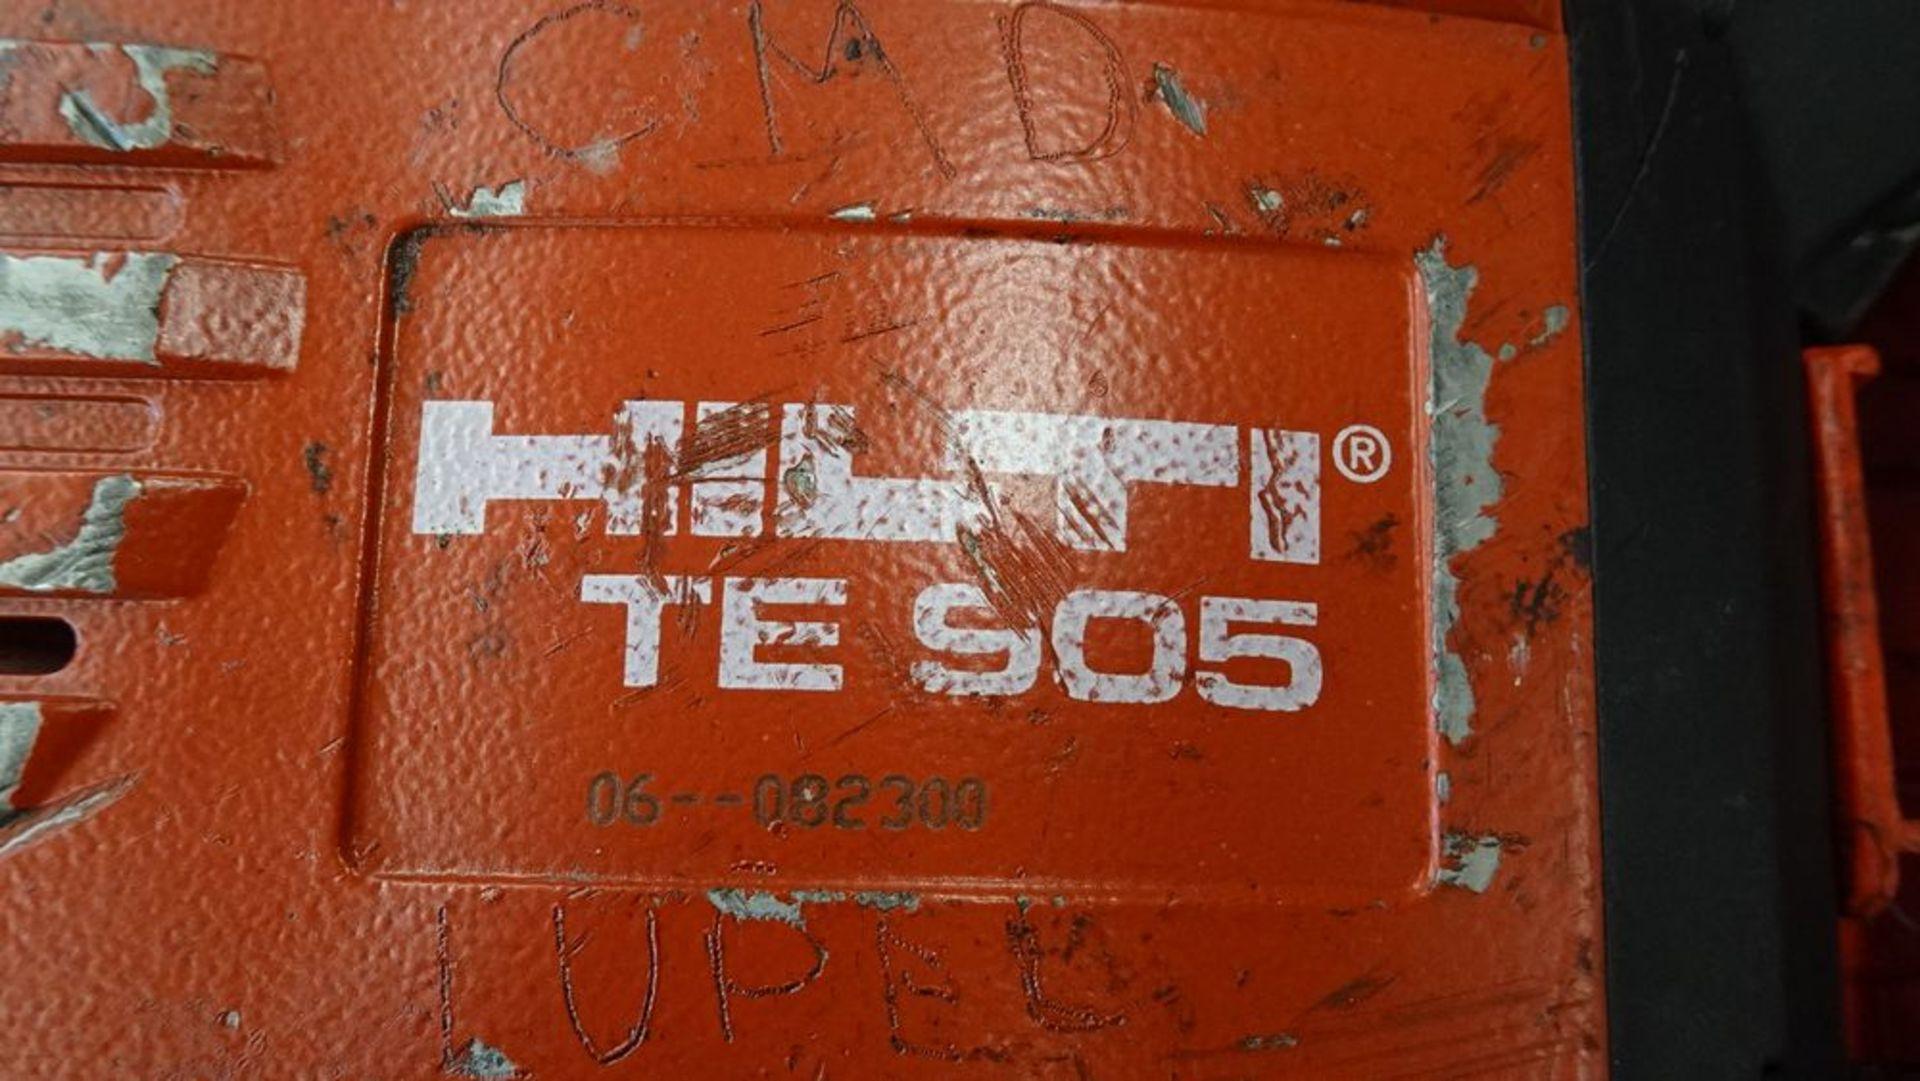 Lot 7 - HILTI TE-905 ROTARY HAMMER C/W CASE, S/N 06-082300